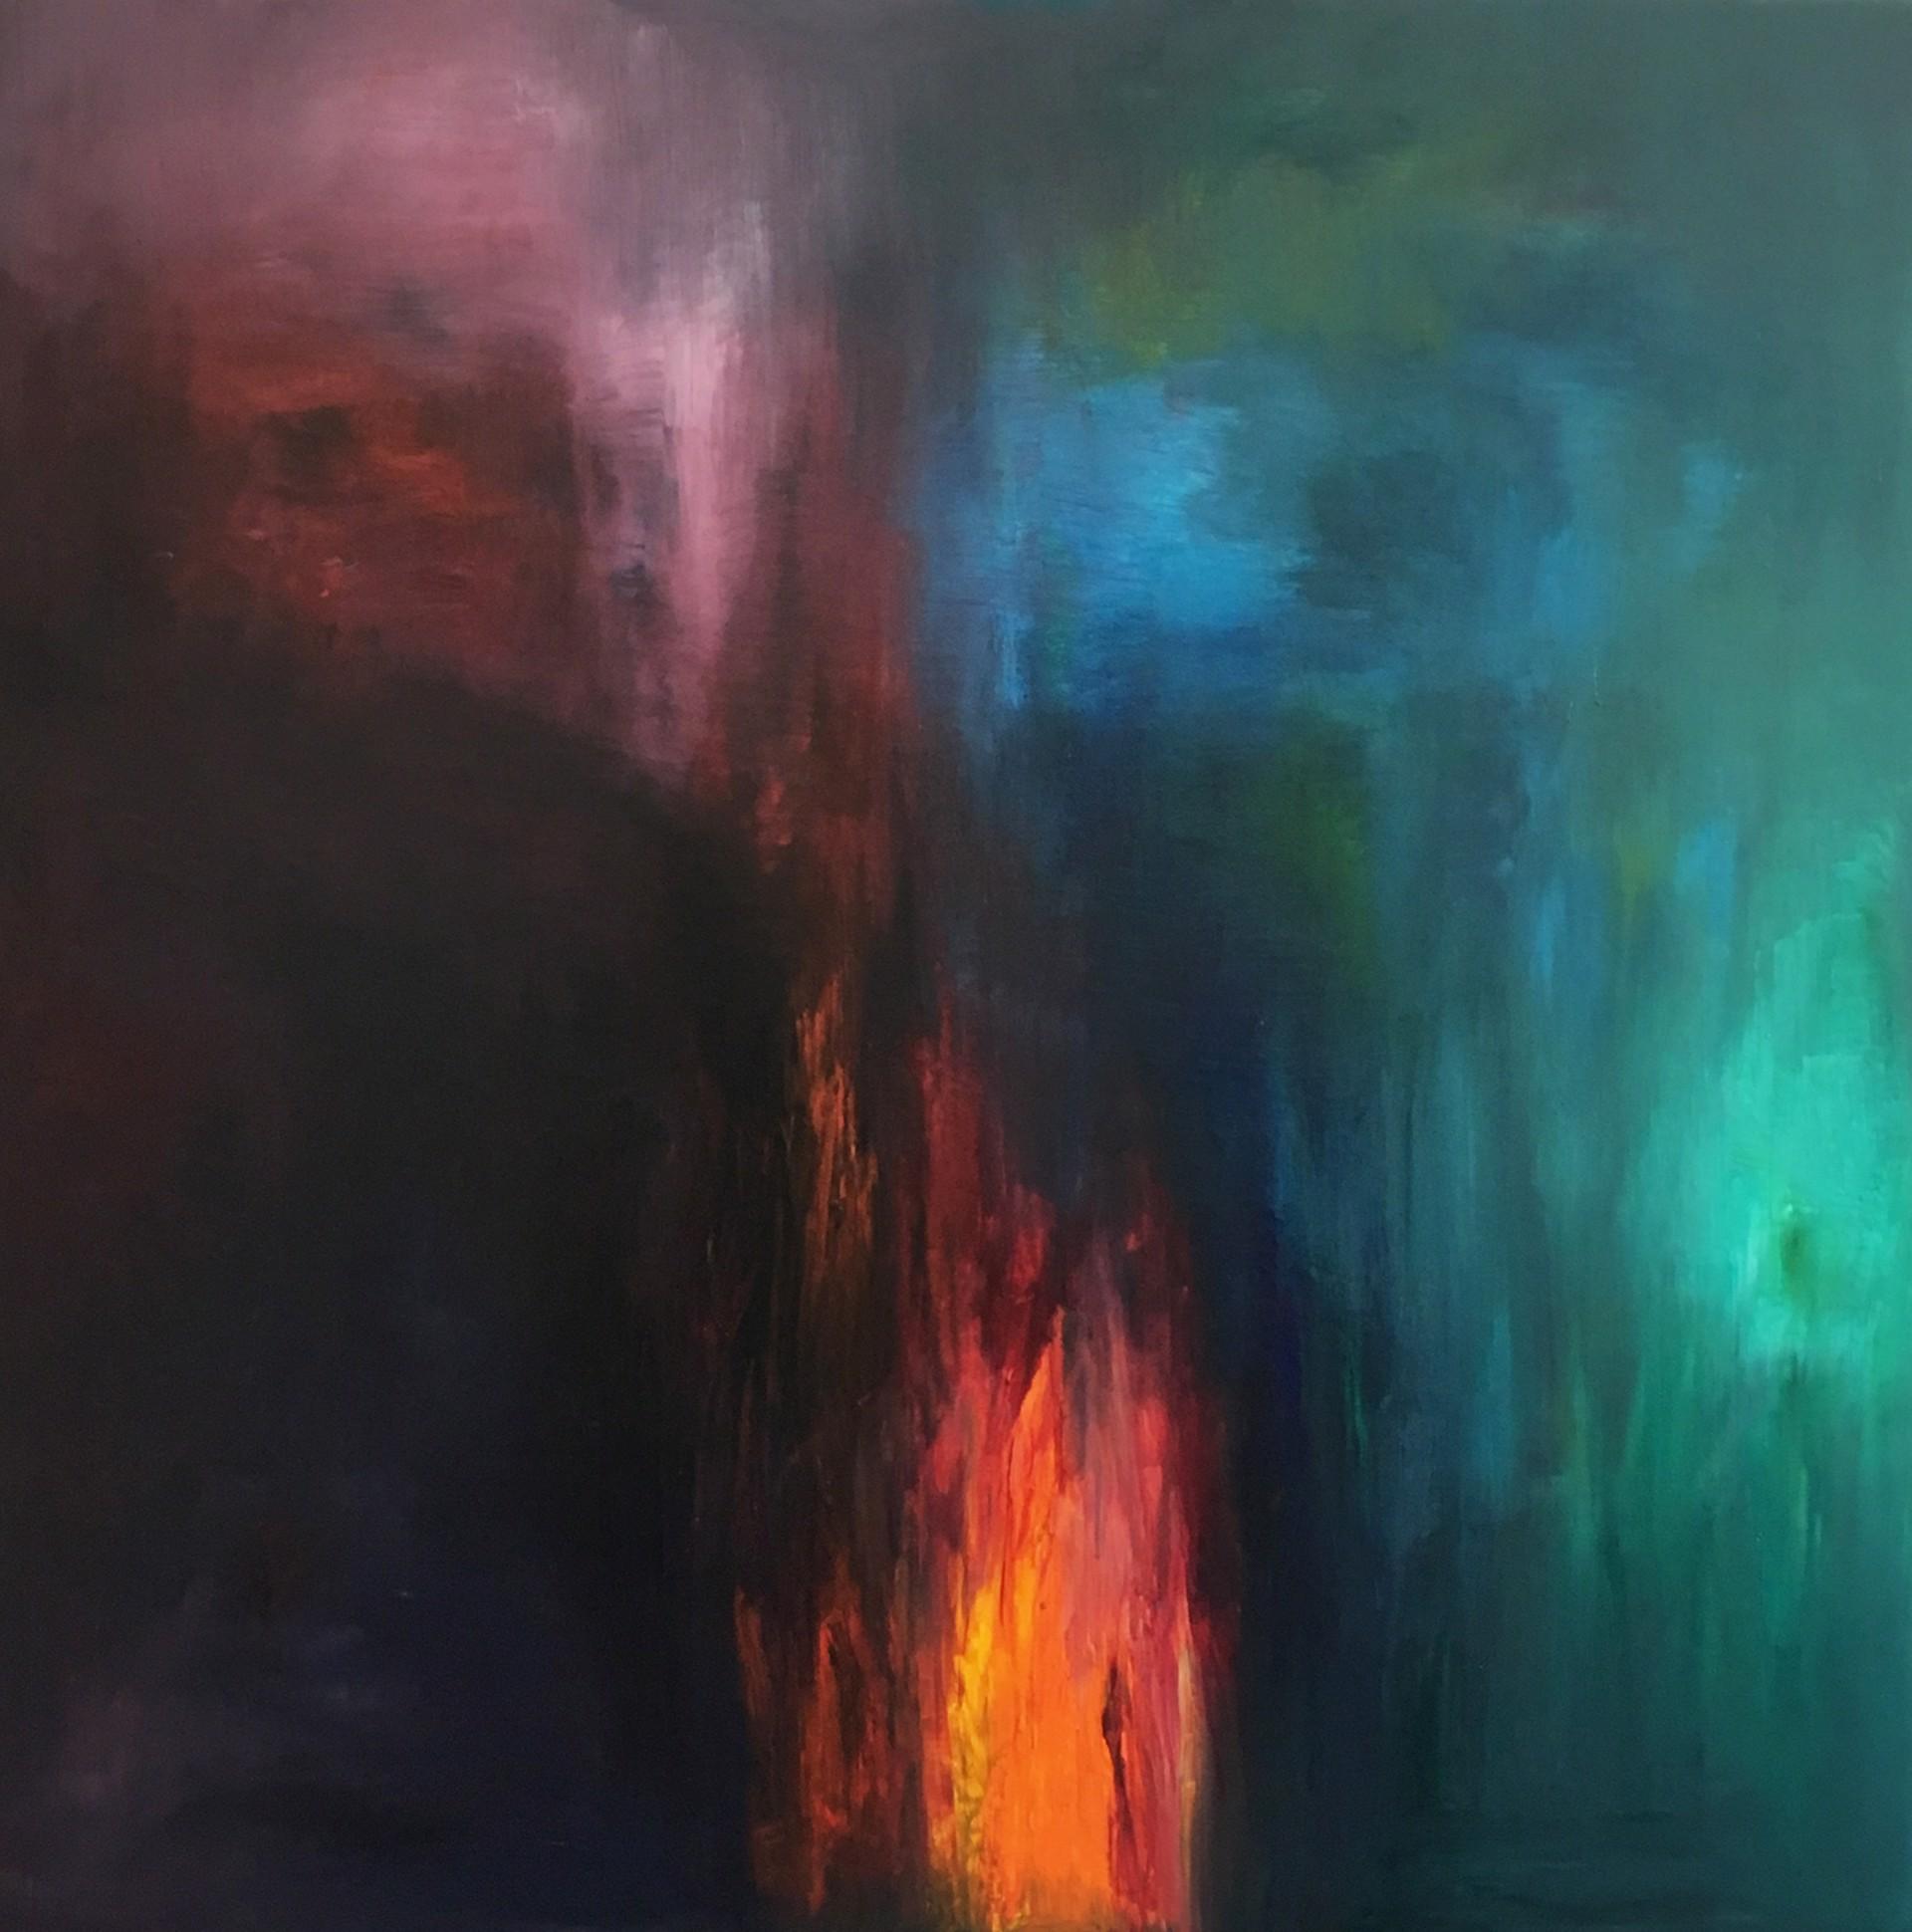 No. 10 Fire & Rain by MD Tokon